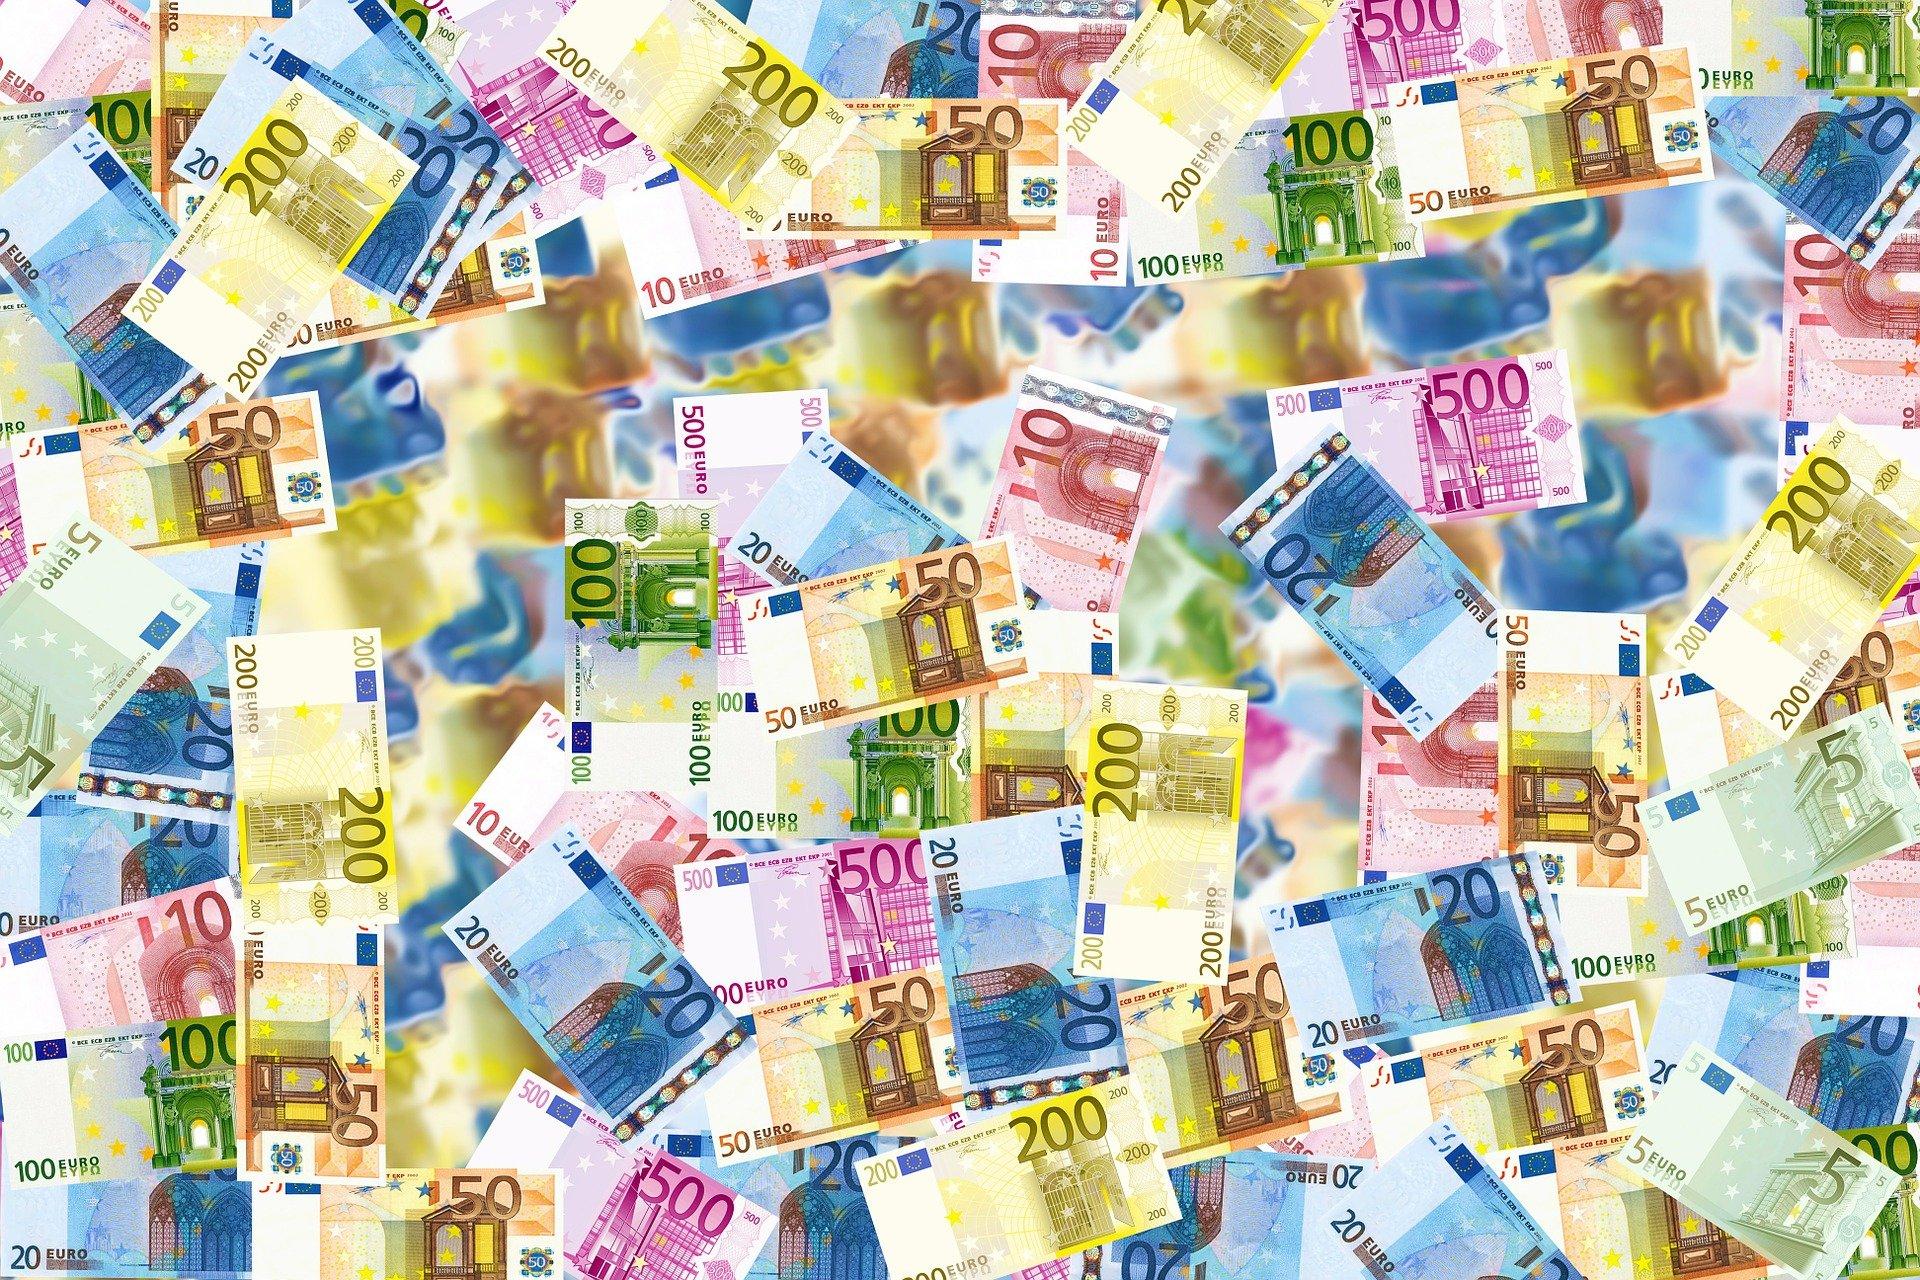 Aplikasi Penghasil Uang 2021 - Artikel Tekno